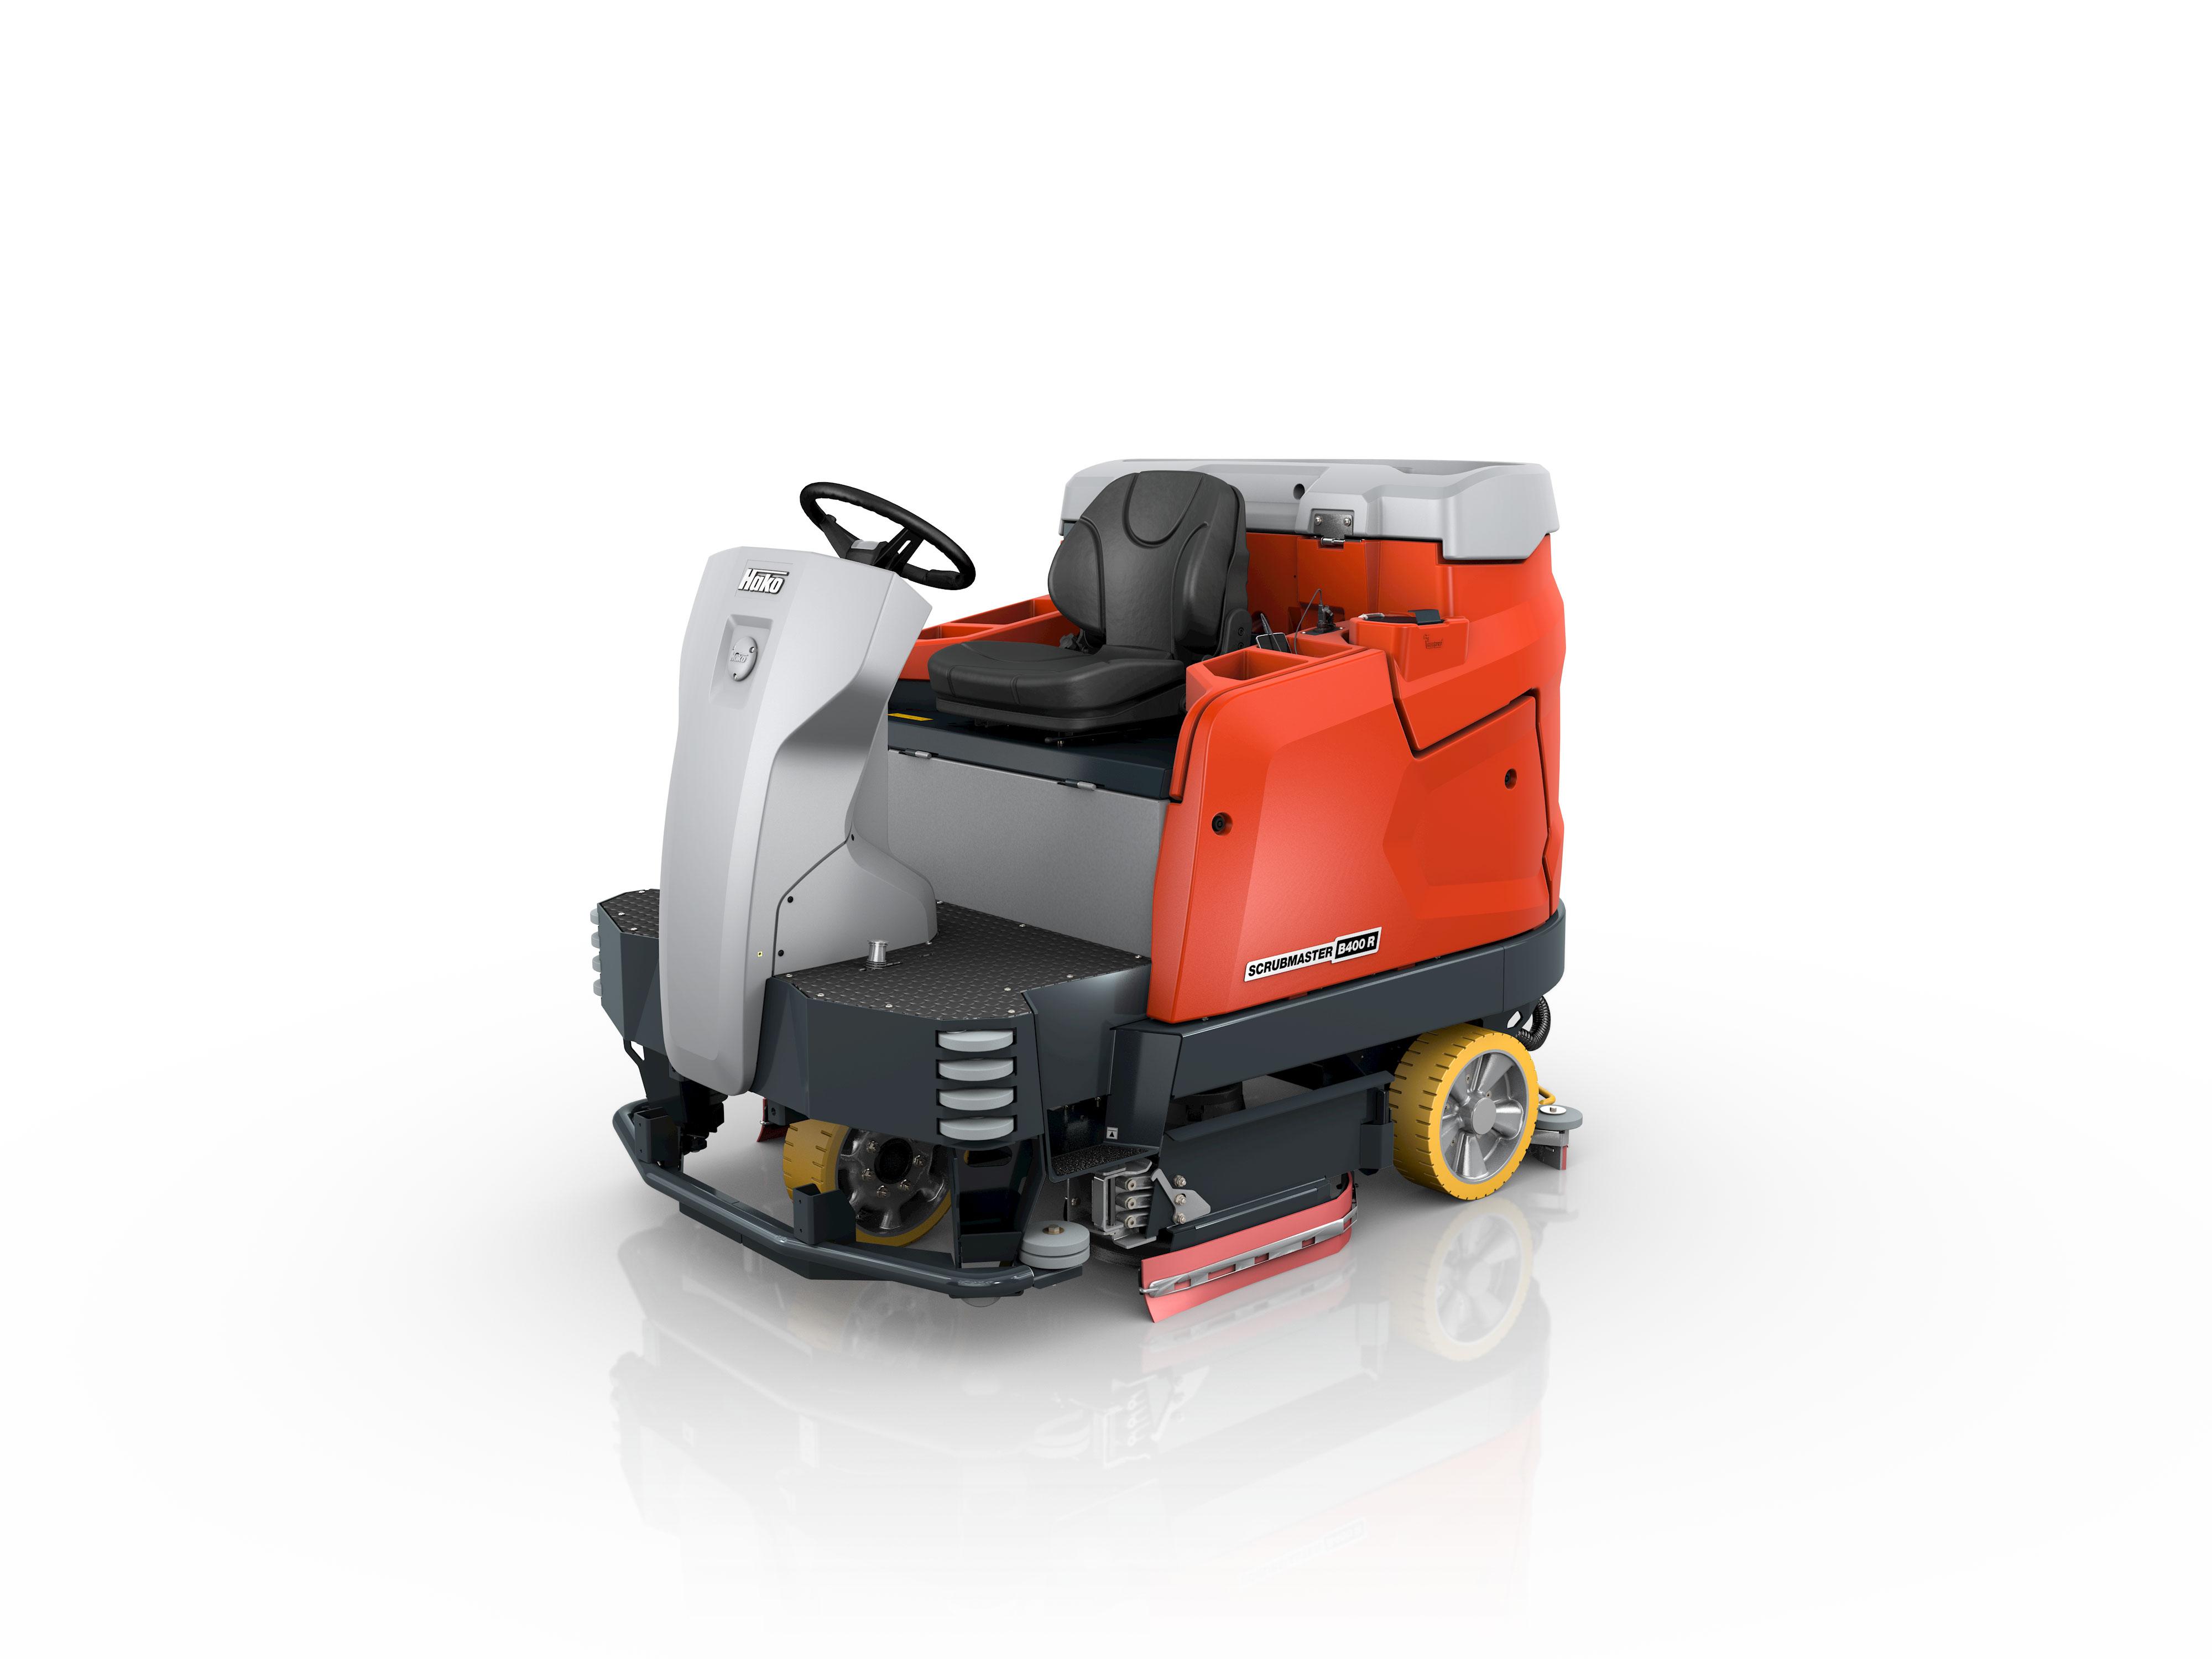 Scrubmaster B400 R Scrubber-drier